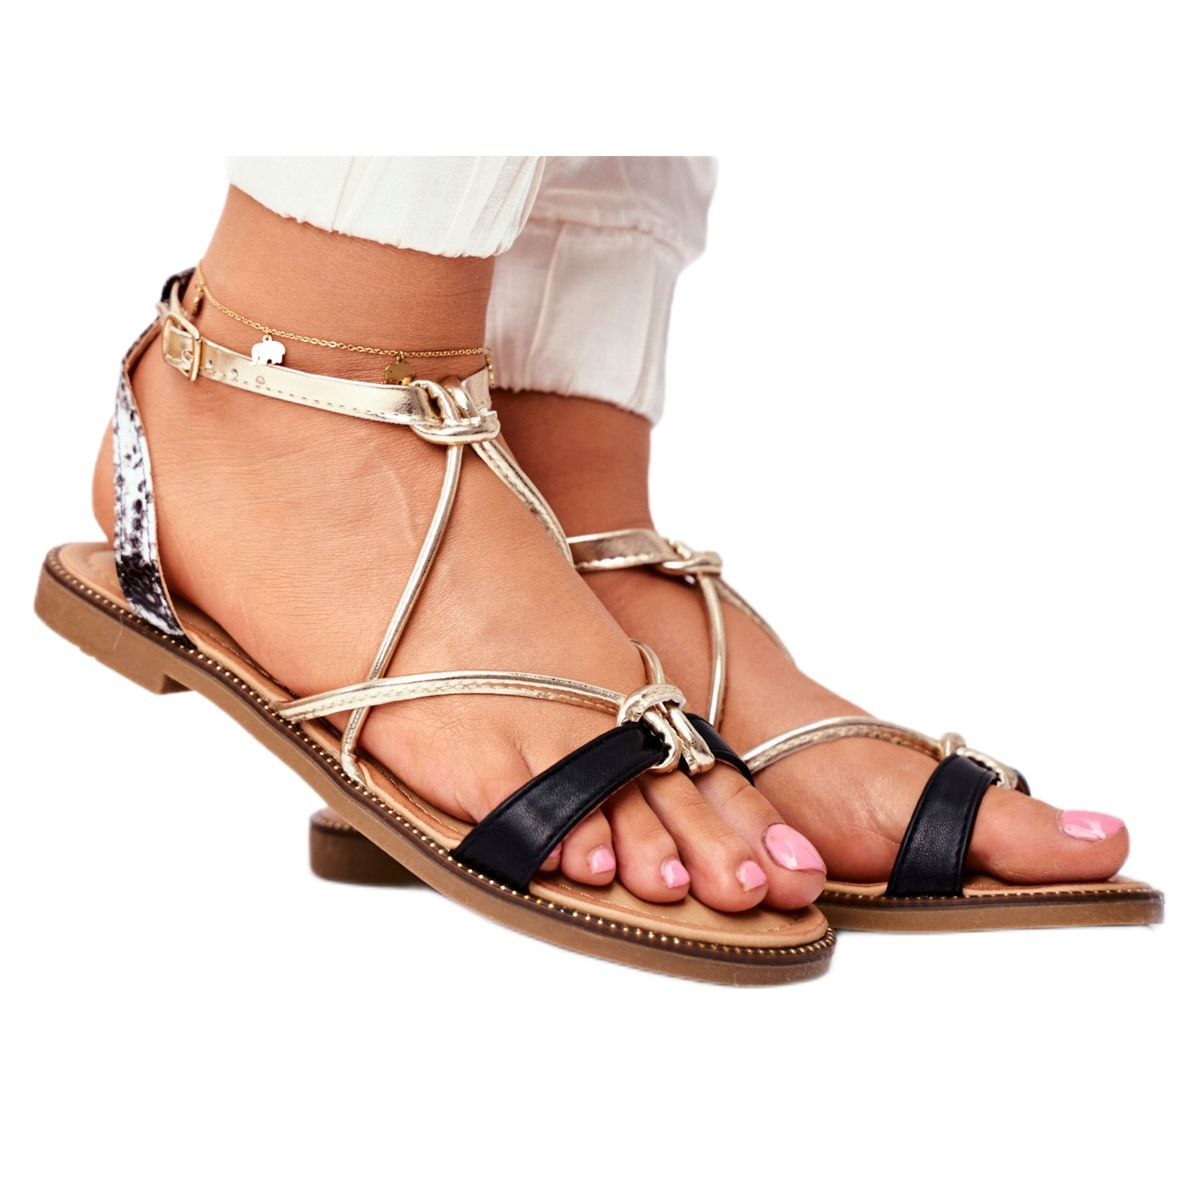 S Barski Sandaly Damskie Plaskie Czarno Zlote Barski Samim Czarne Zolte Shoes Sandals Fashion